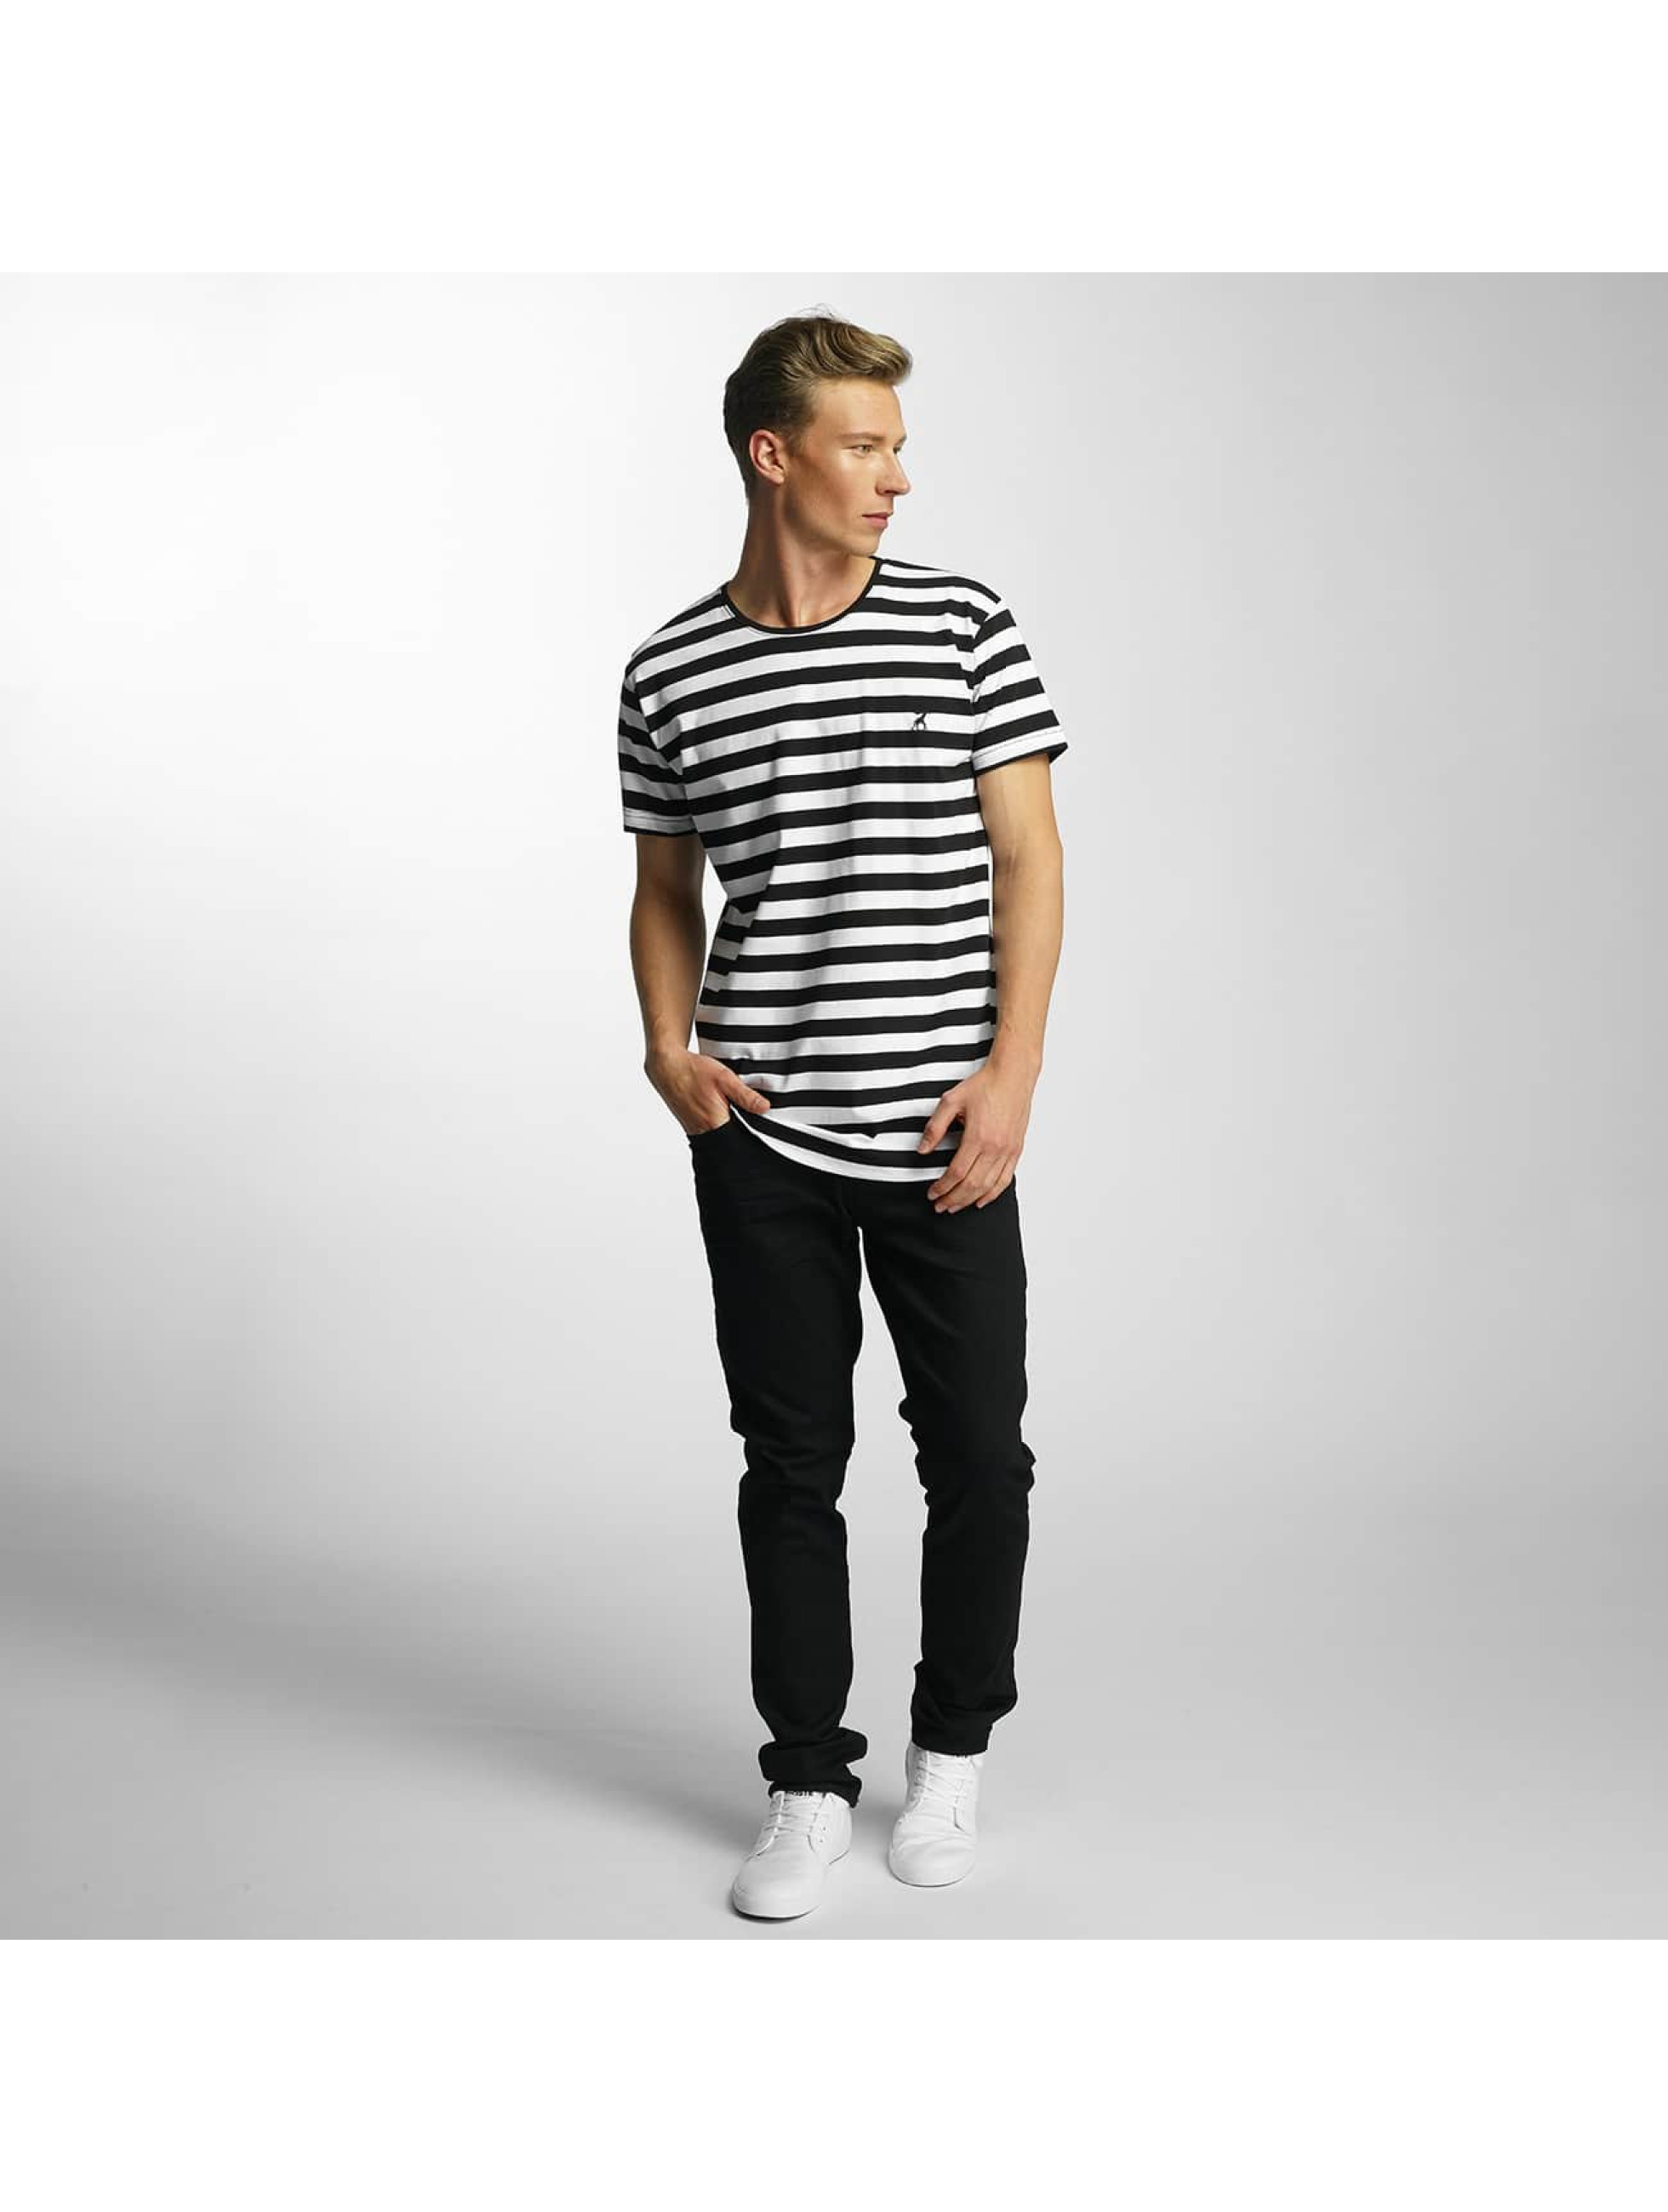 Cazzy Clang T-Shirt Stripes *B-Ware* black